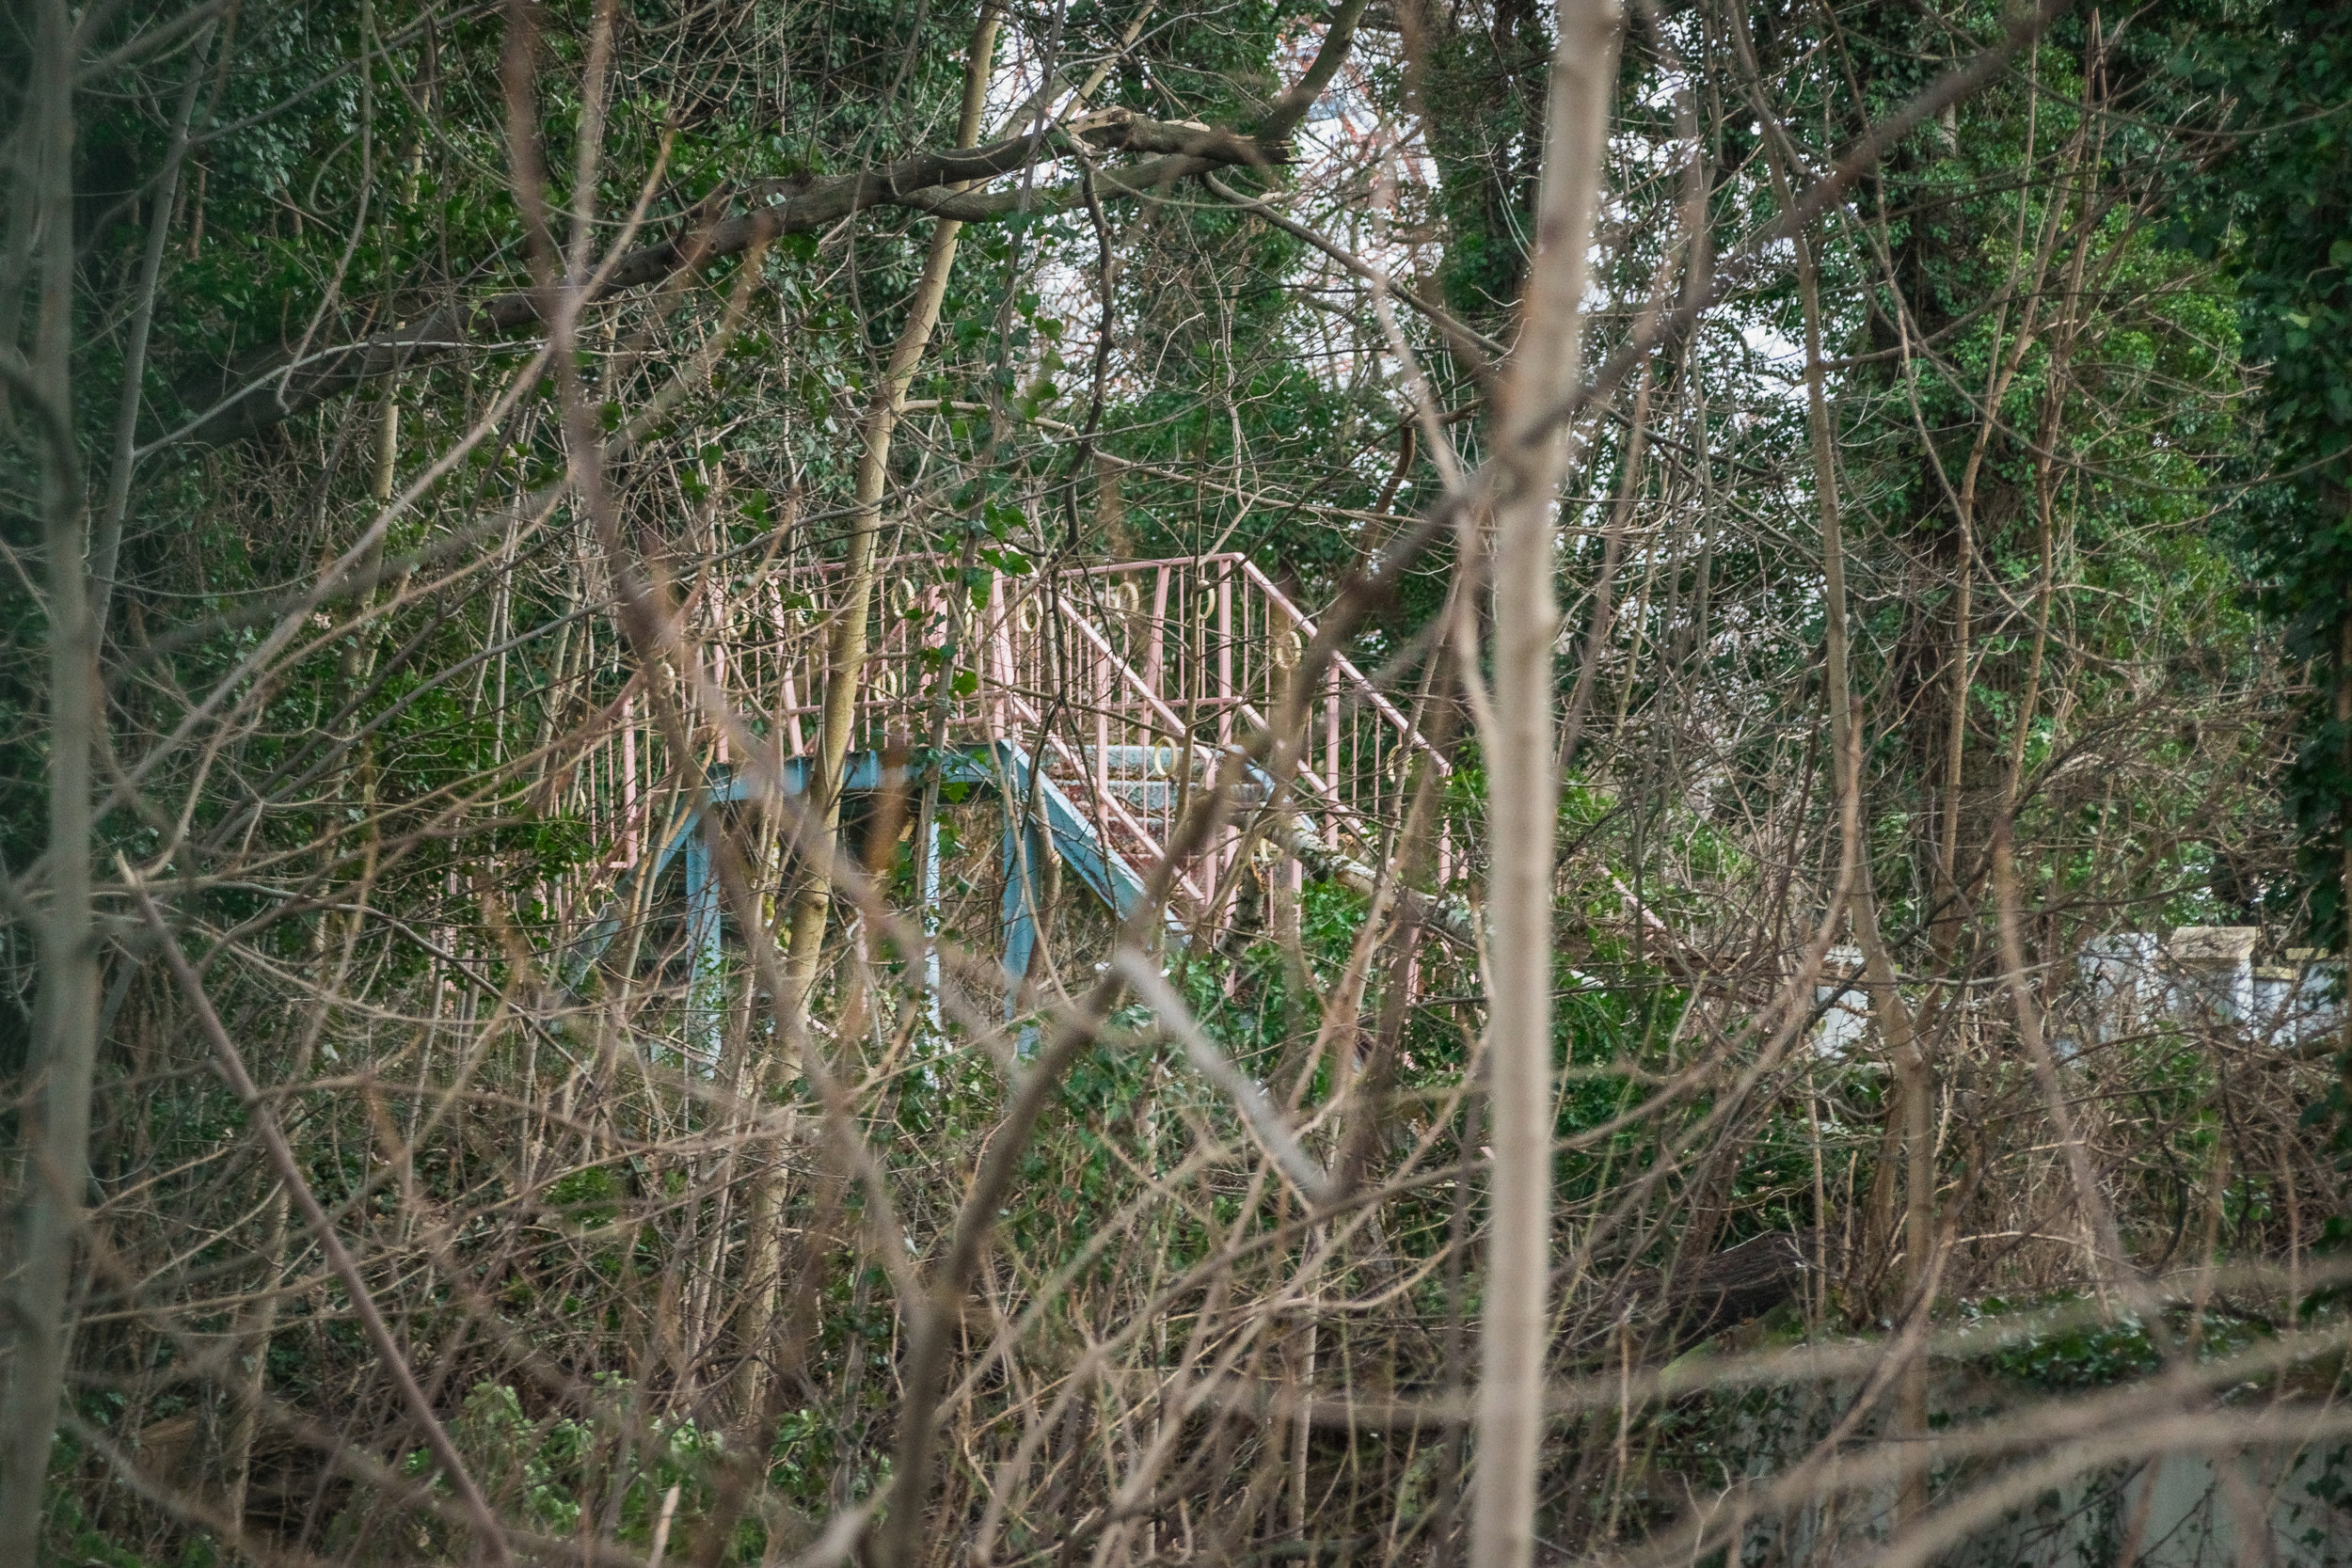 the very 1980s baby blue & pink wrought iron bridge